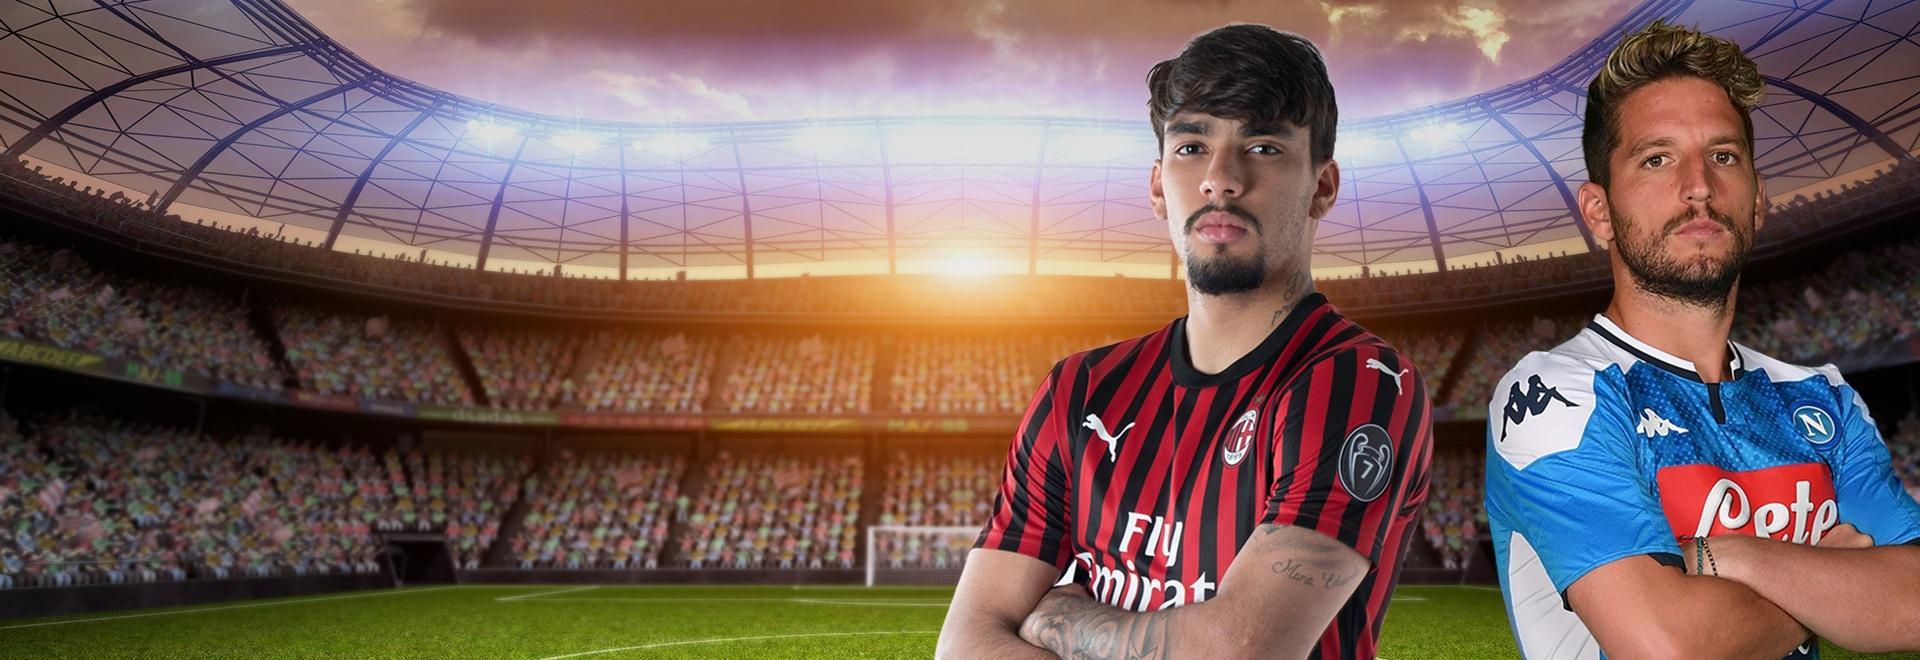 Milan - Napoli. 13a g.